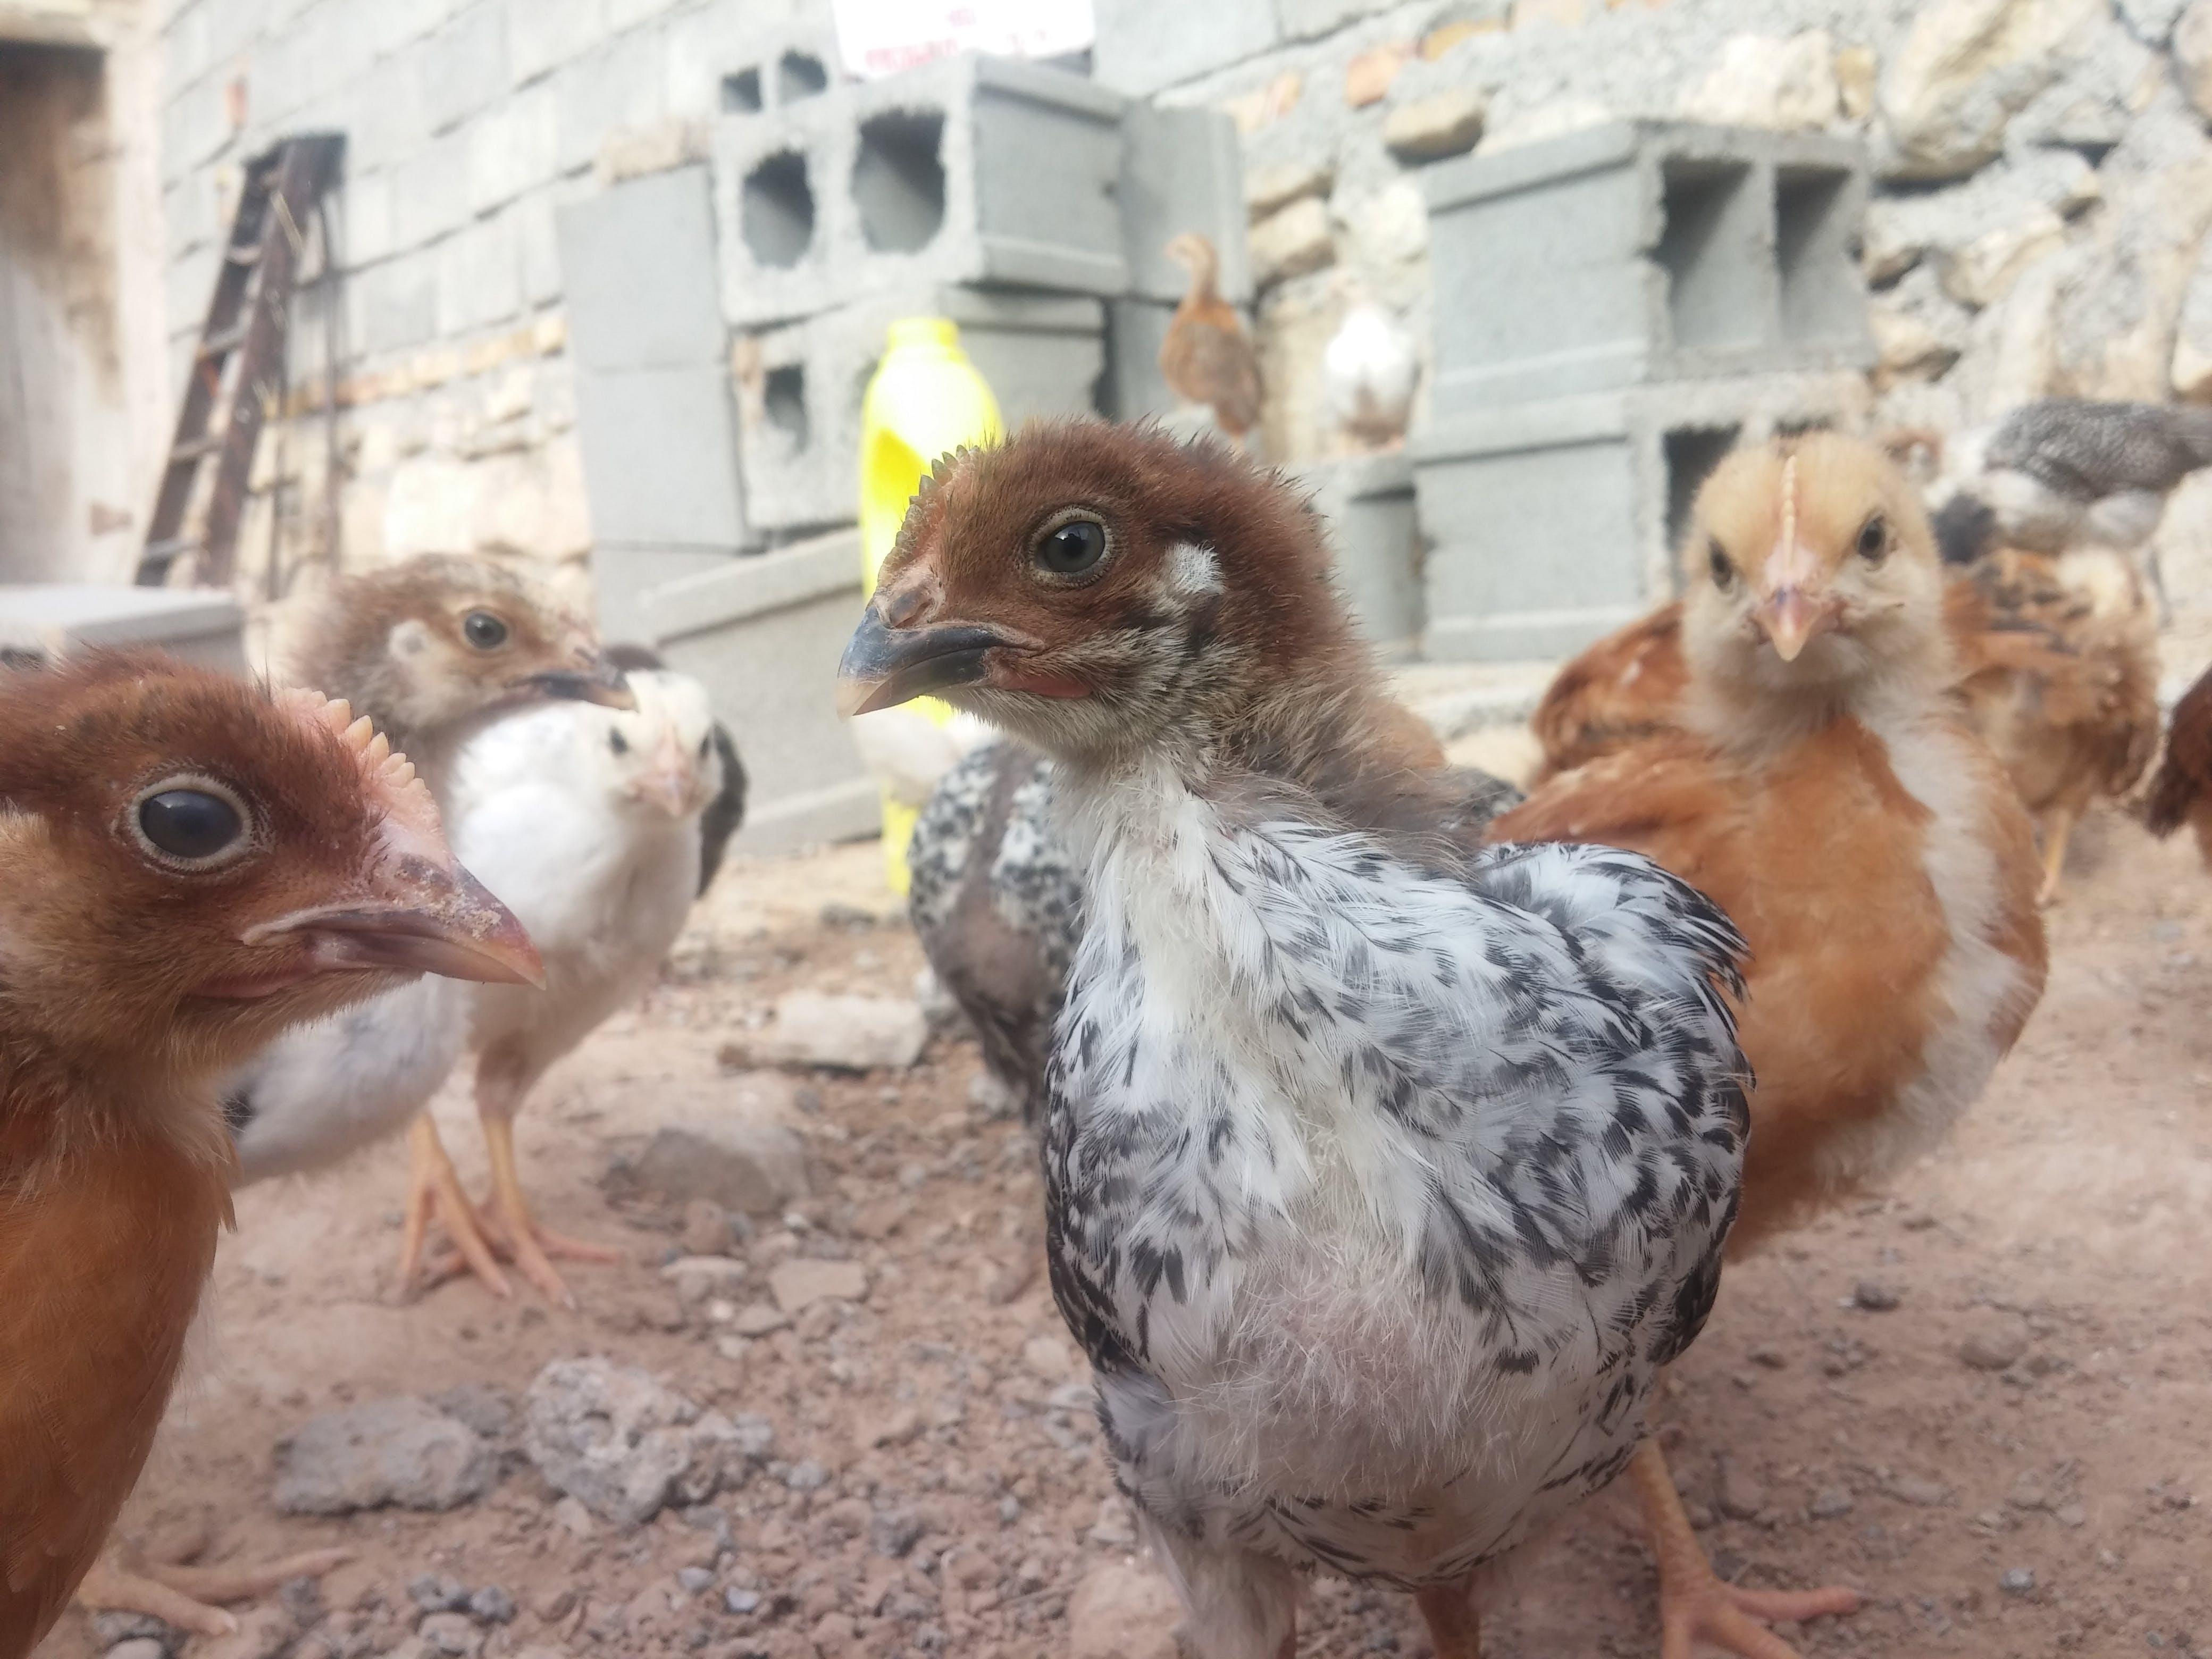 Free stock photo of Baby Chicken